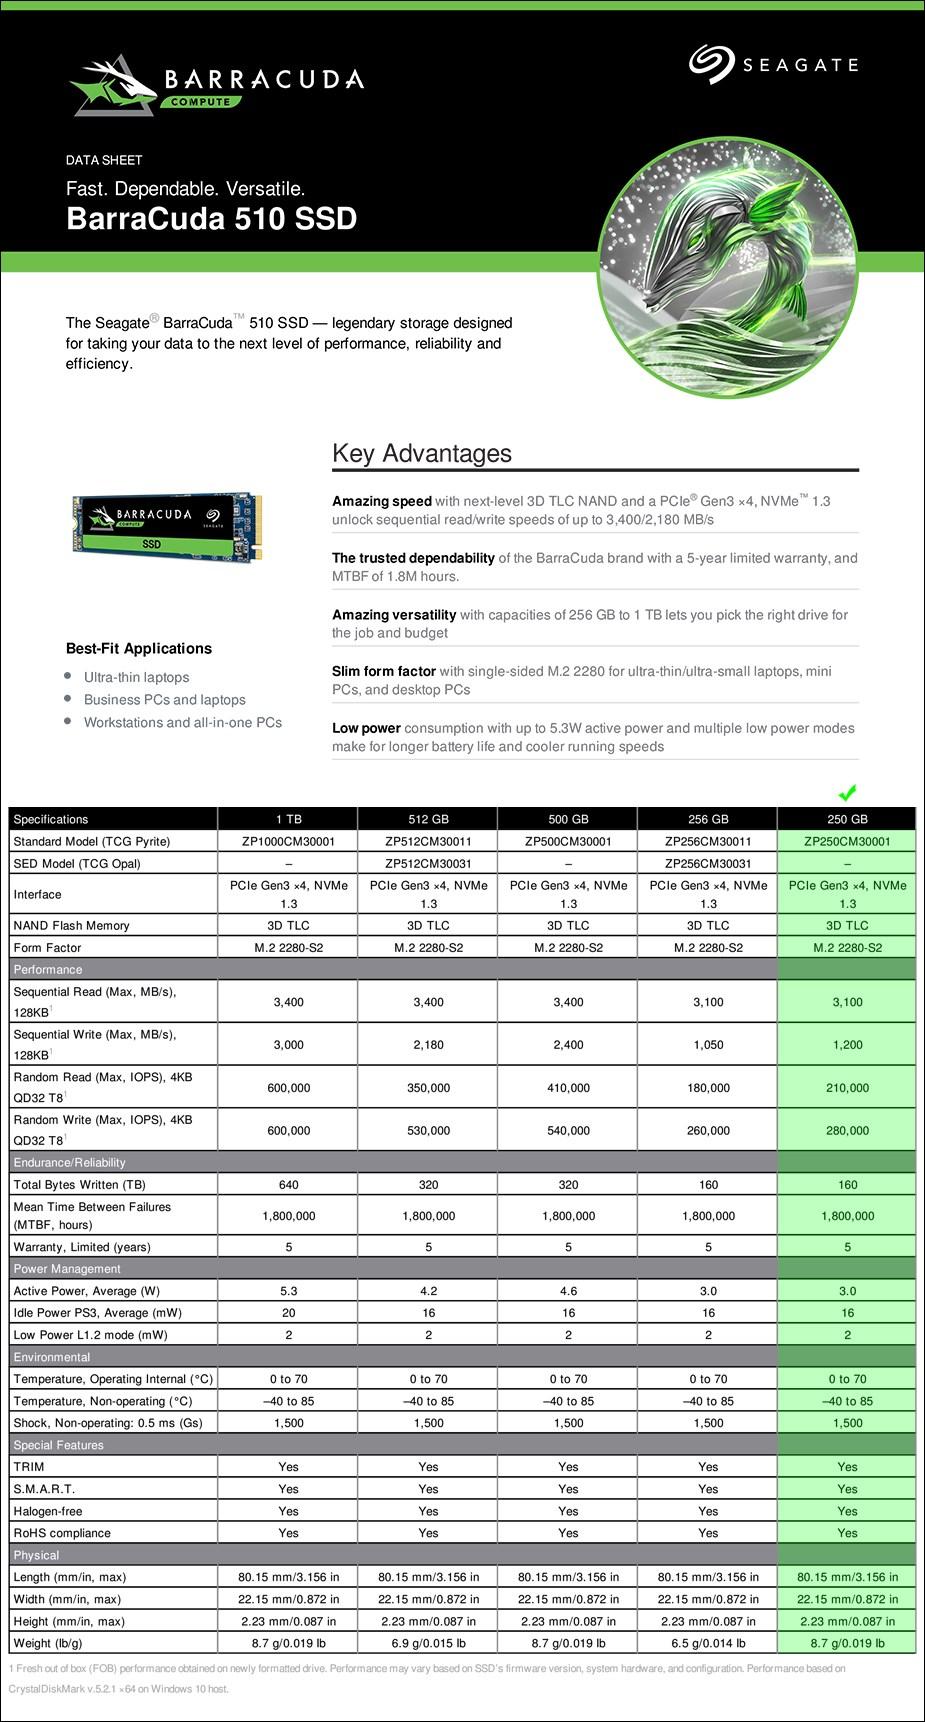 Seagate BarraCuda 510 250GB NVMe M.2 2280-S2 SSD - ZP250CM3A001 - Overview 2